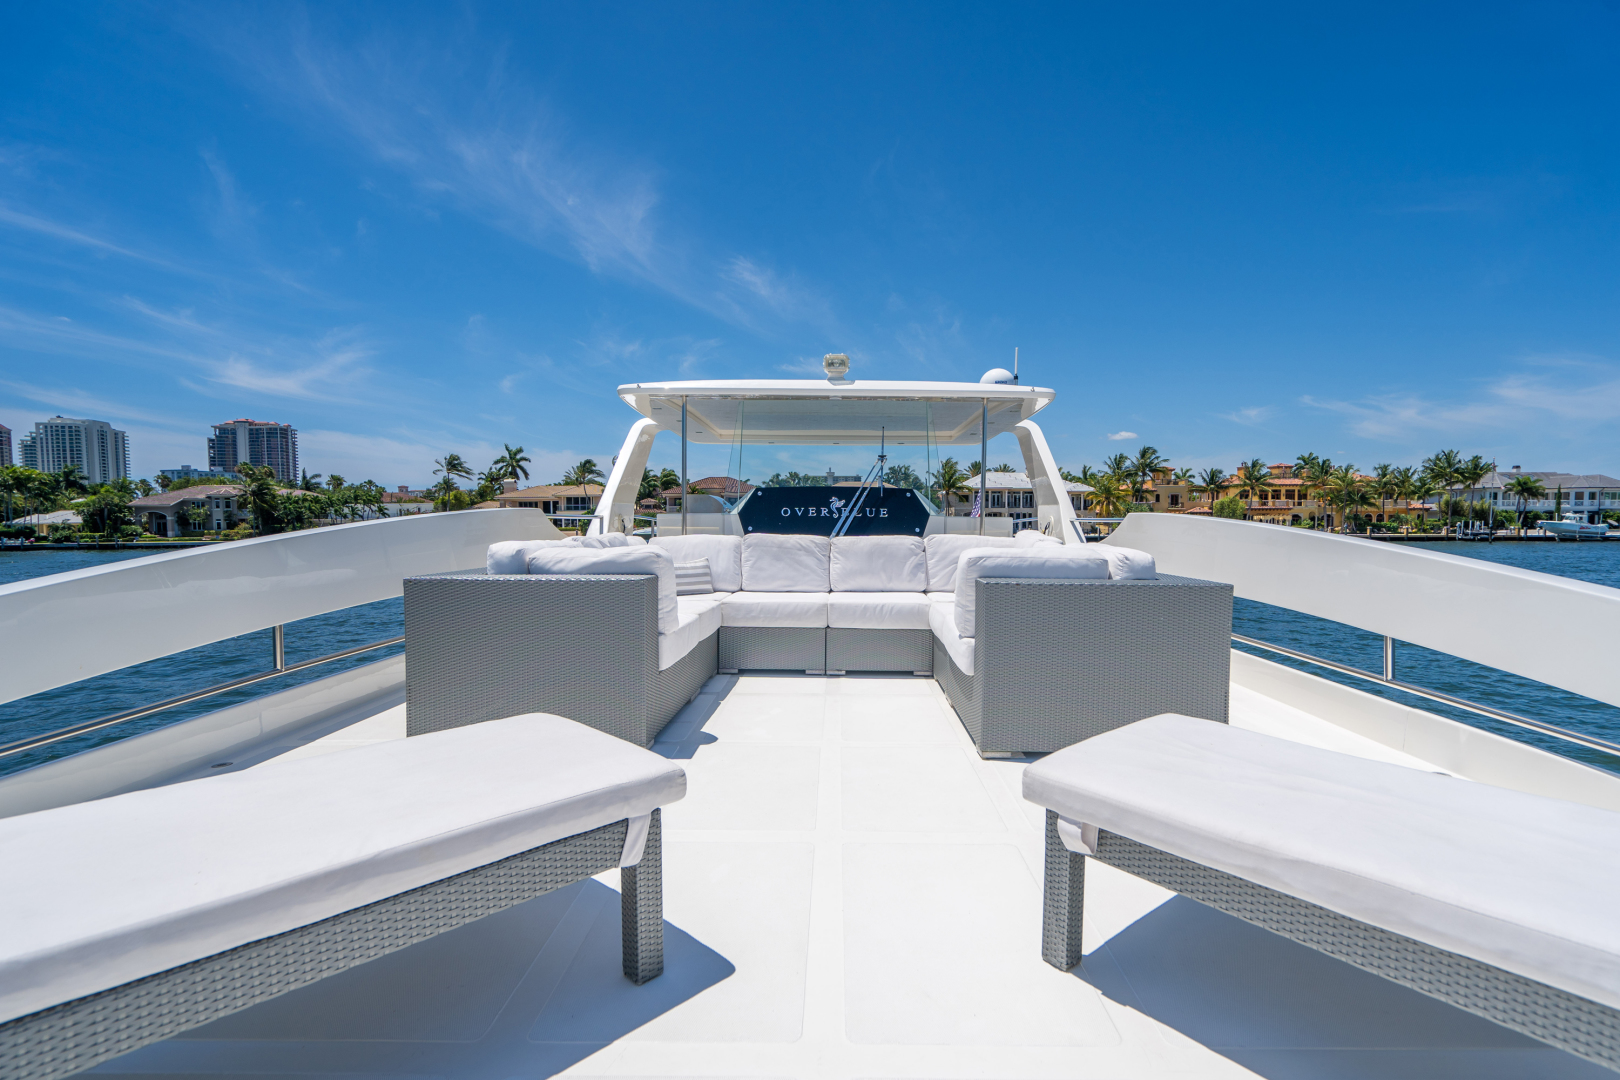 Overblue-58 Power Catamaran 2017-Techuila Ft. Lauderdale-Florida-United States-2017 Overblue 58 Powercat-1401216   Thumbnail